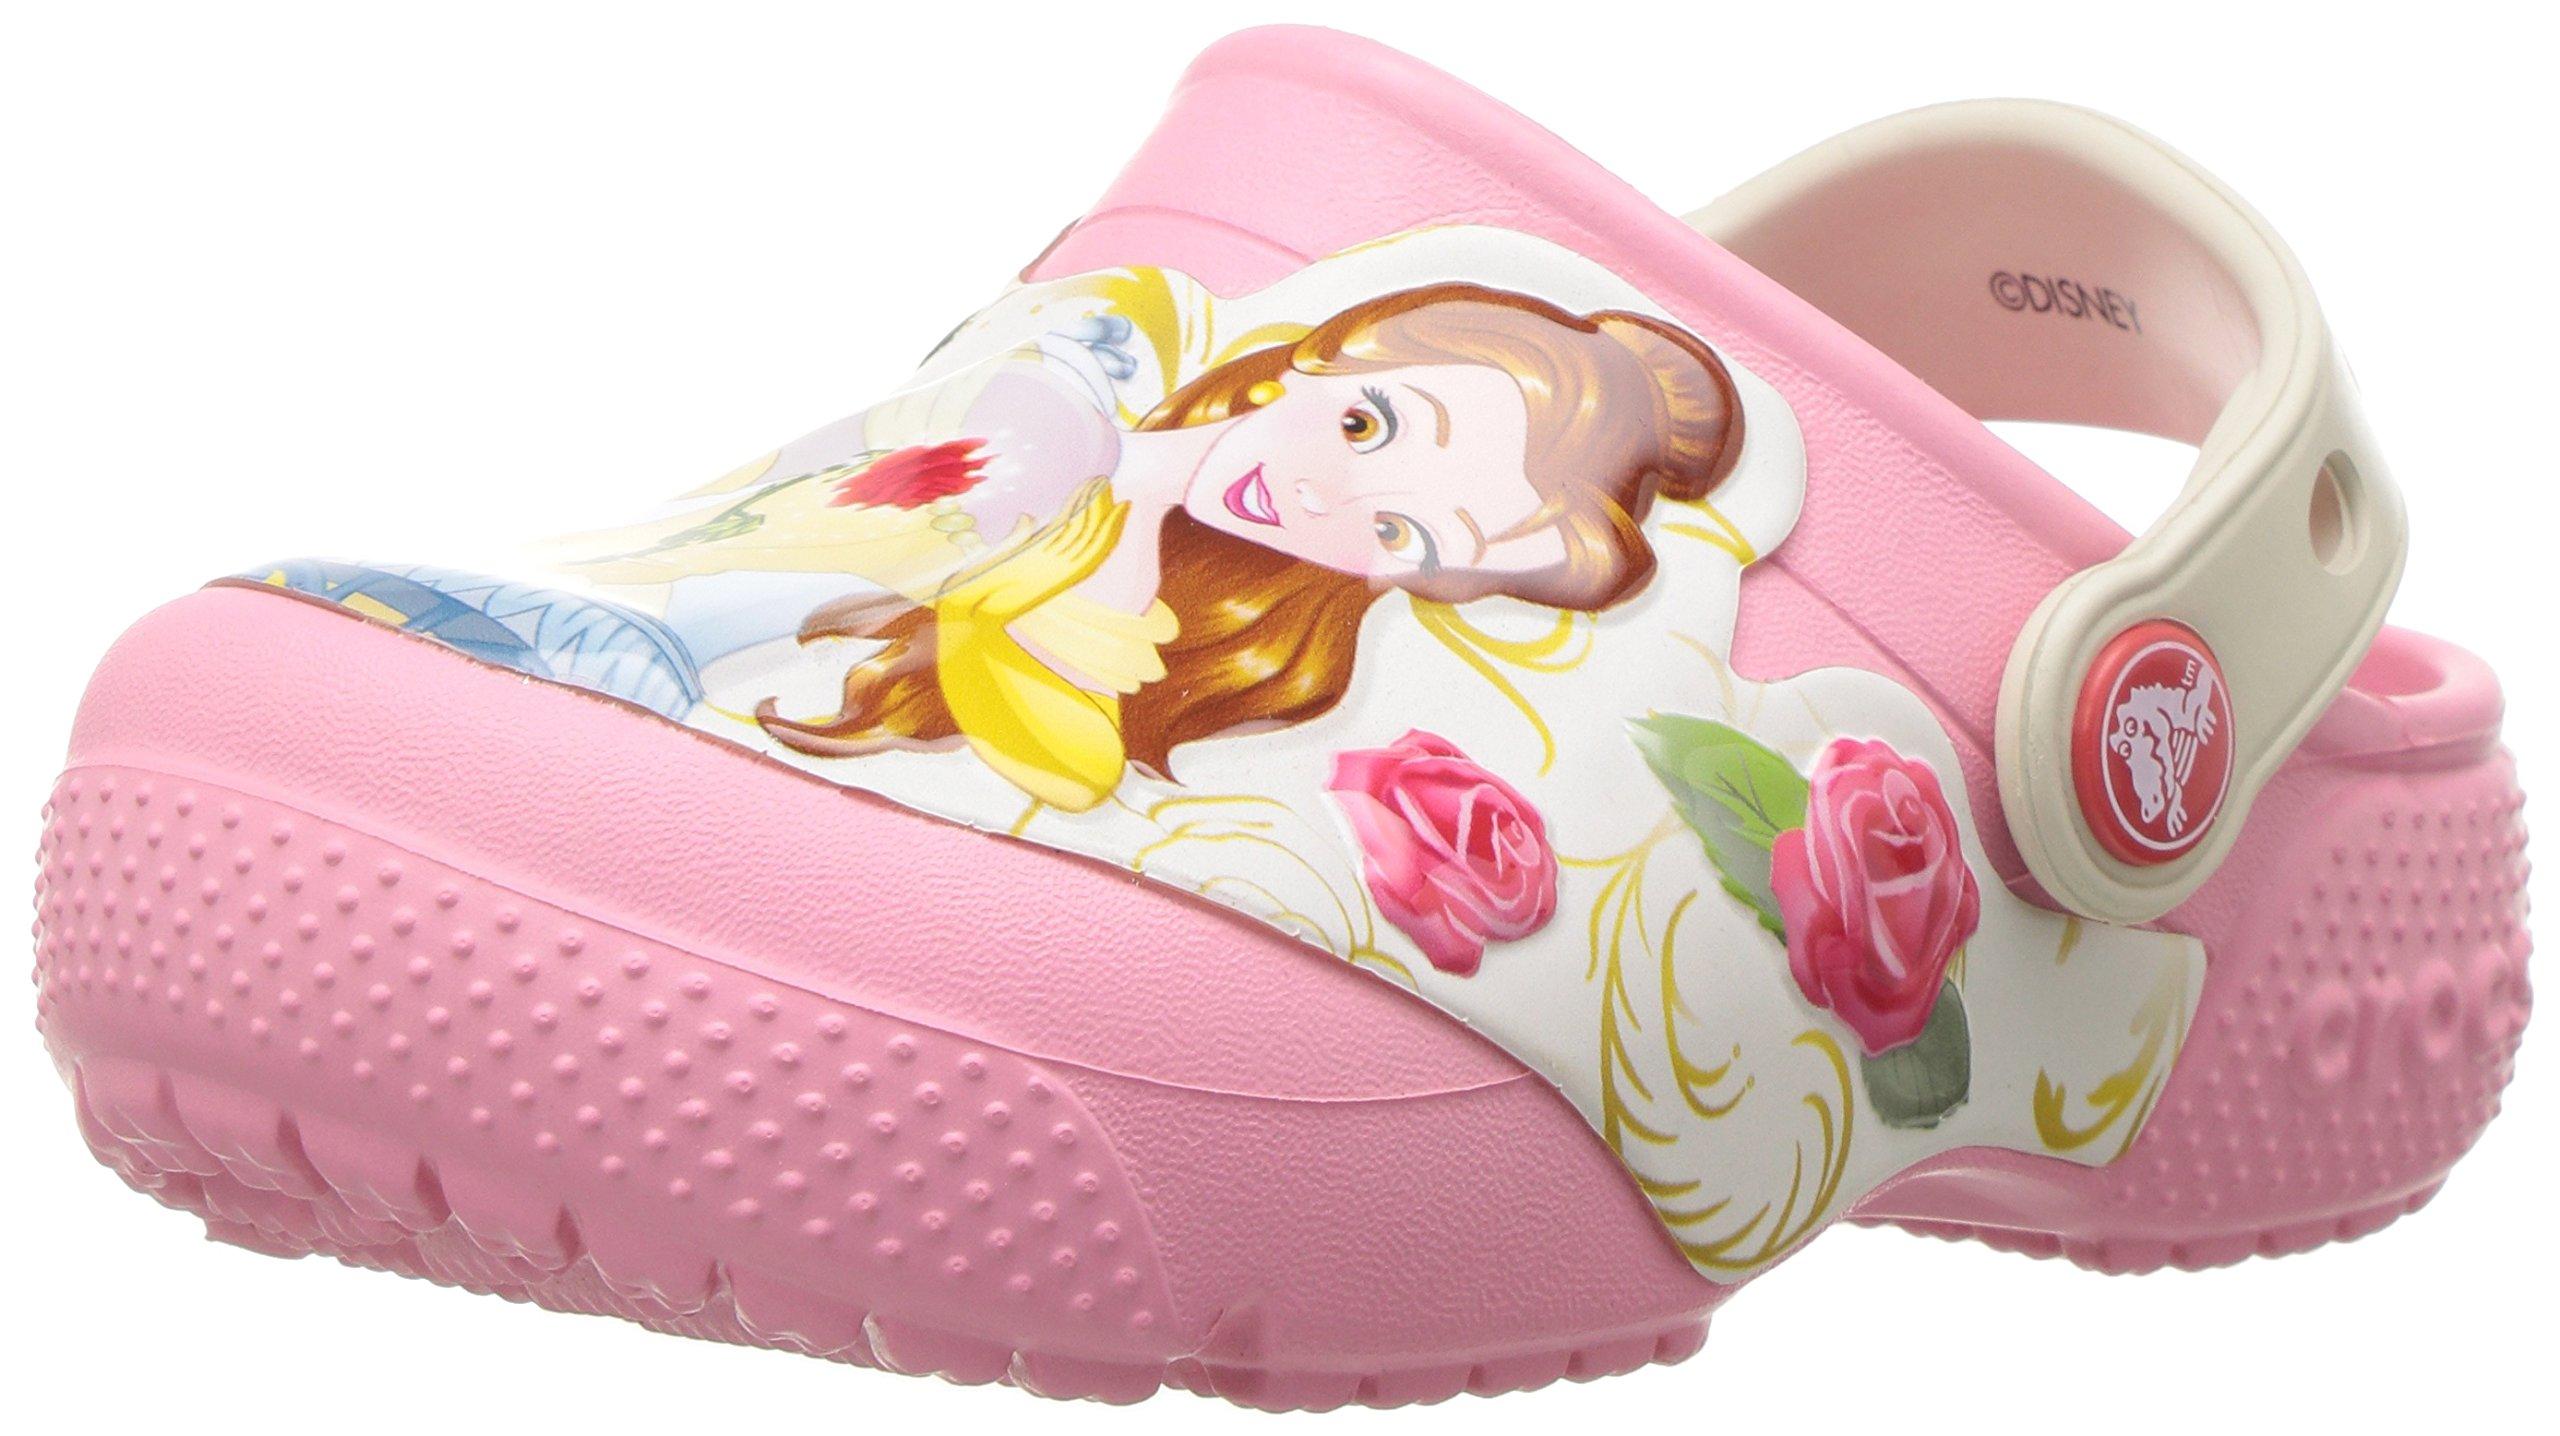 Crocs Kids' Fun Lab Princess Belle Clog, Peony Pink, 3 M US Little Kid